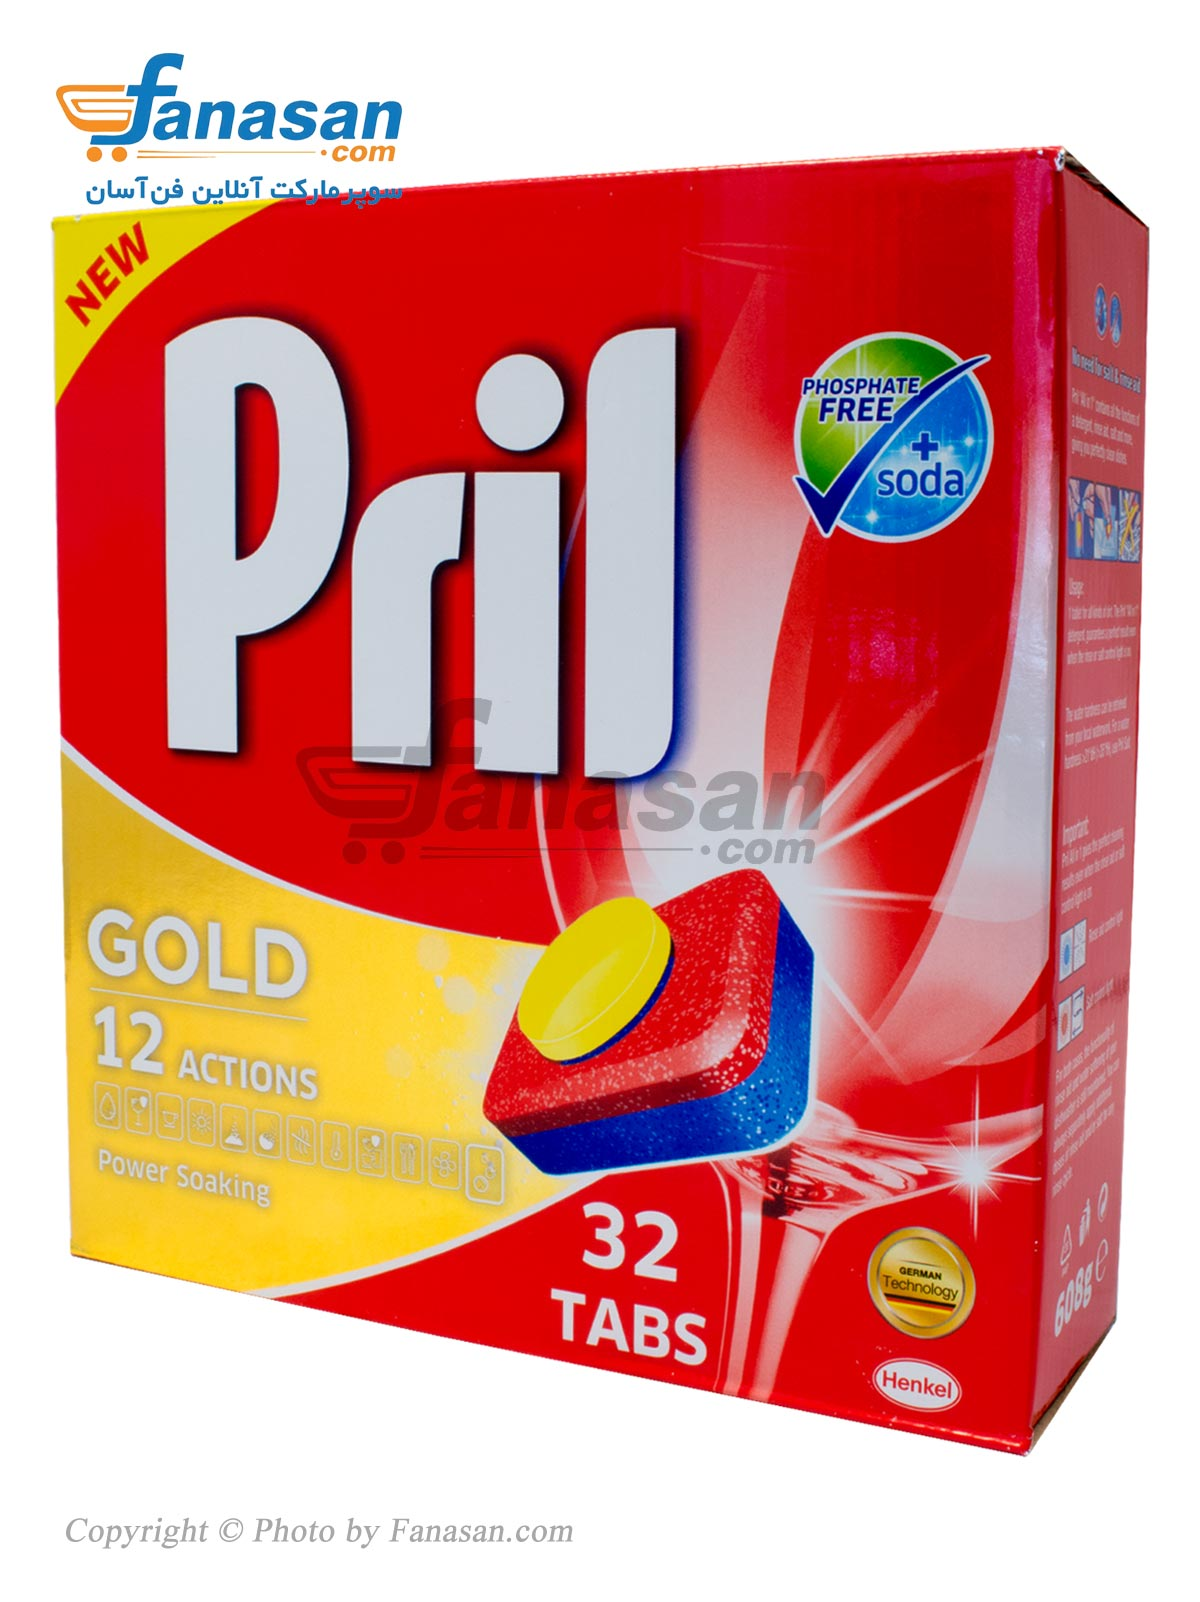 قرص ماشین ظرفشویی پریل مدل طلایی بسته 32 عددی   Pril Gold power soaking 32 pcs